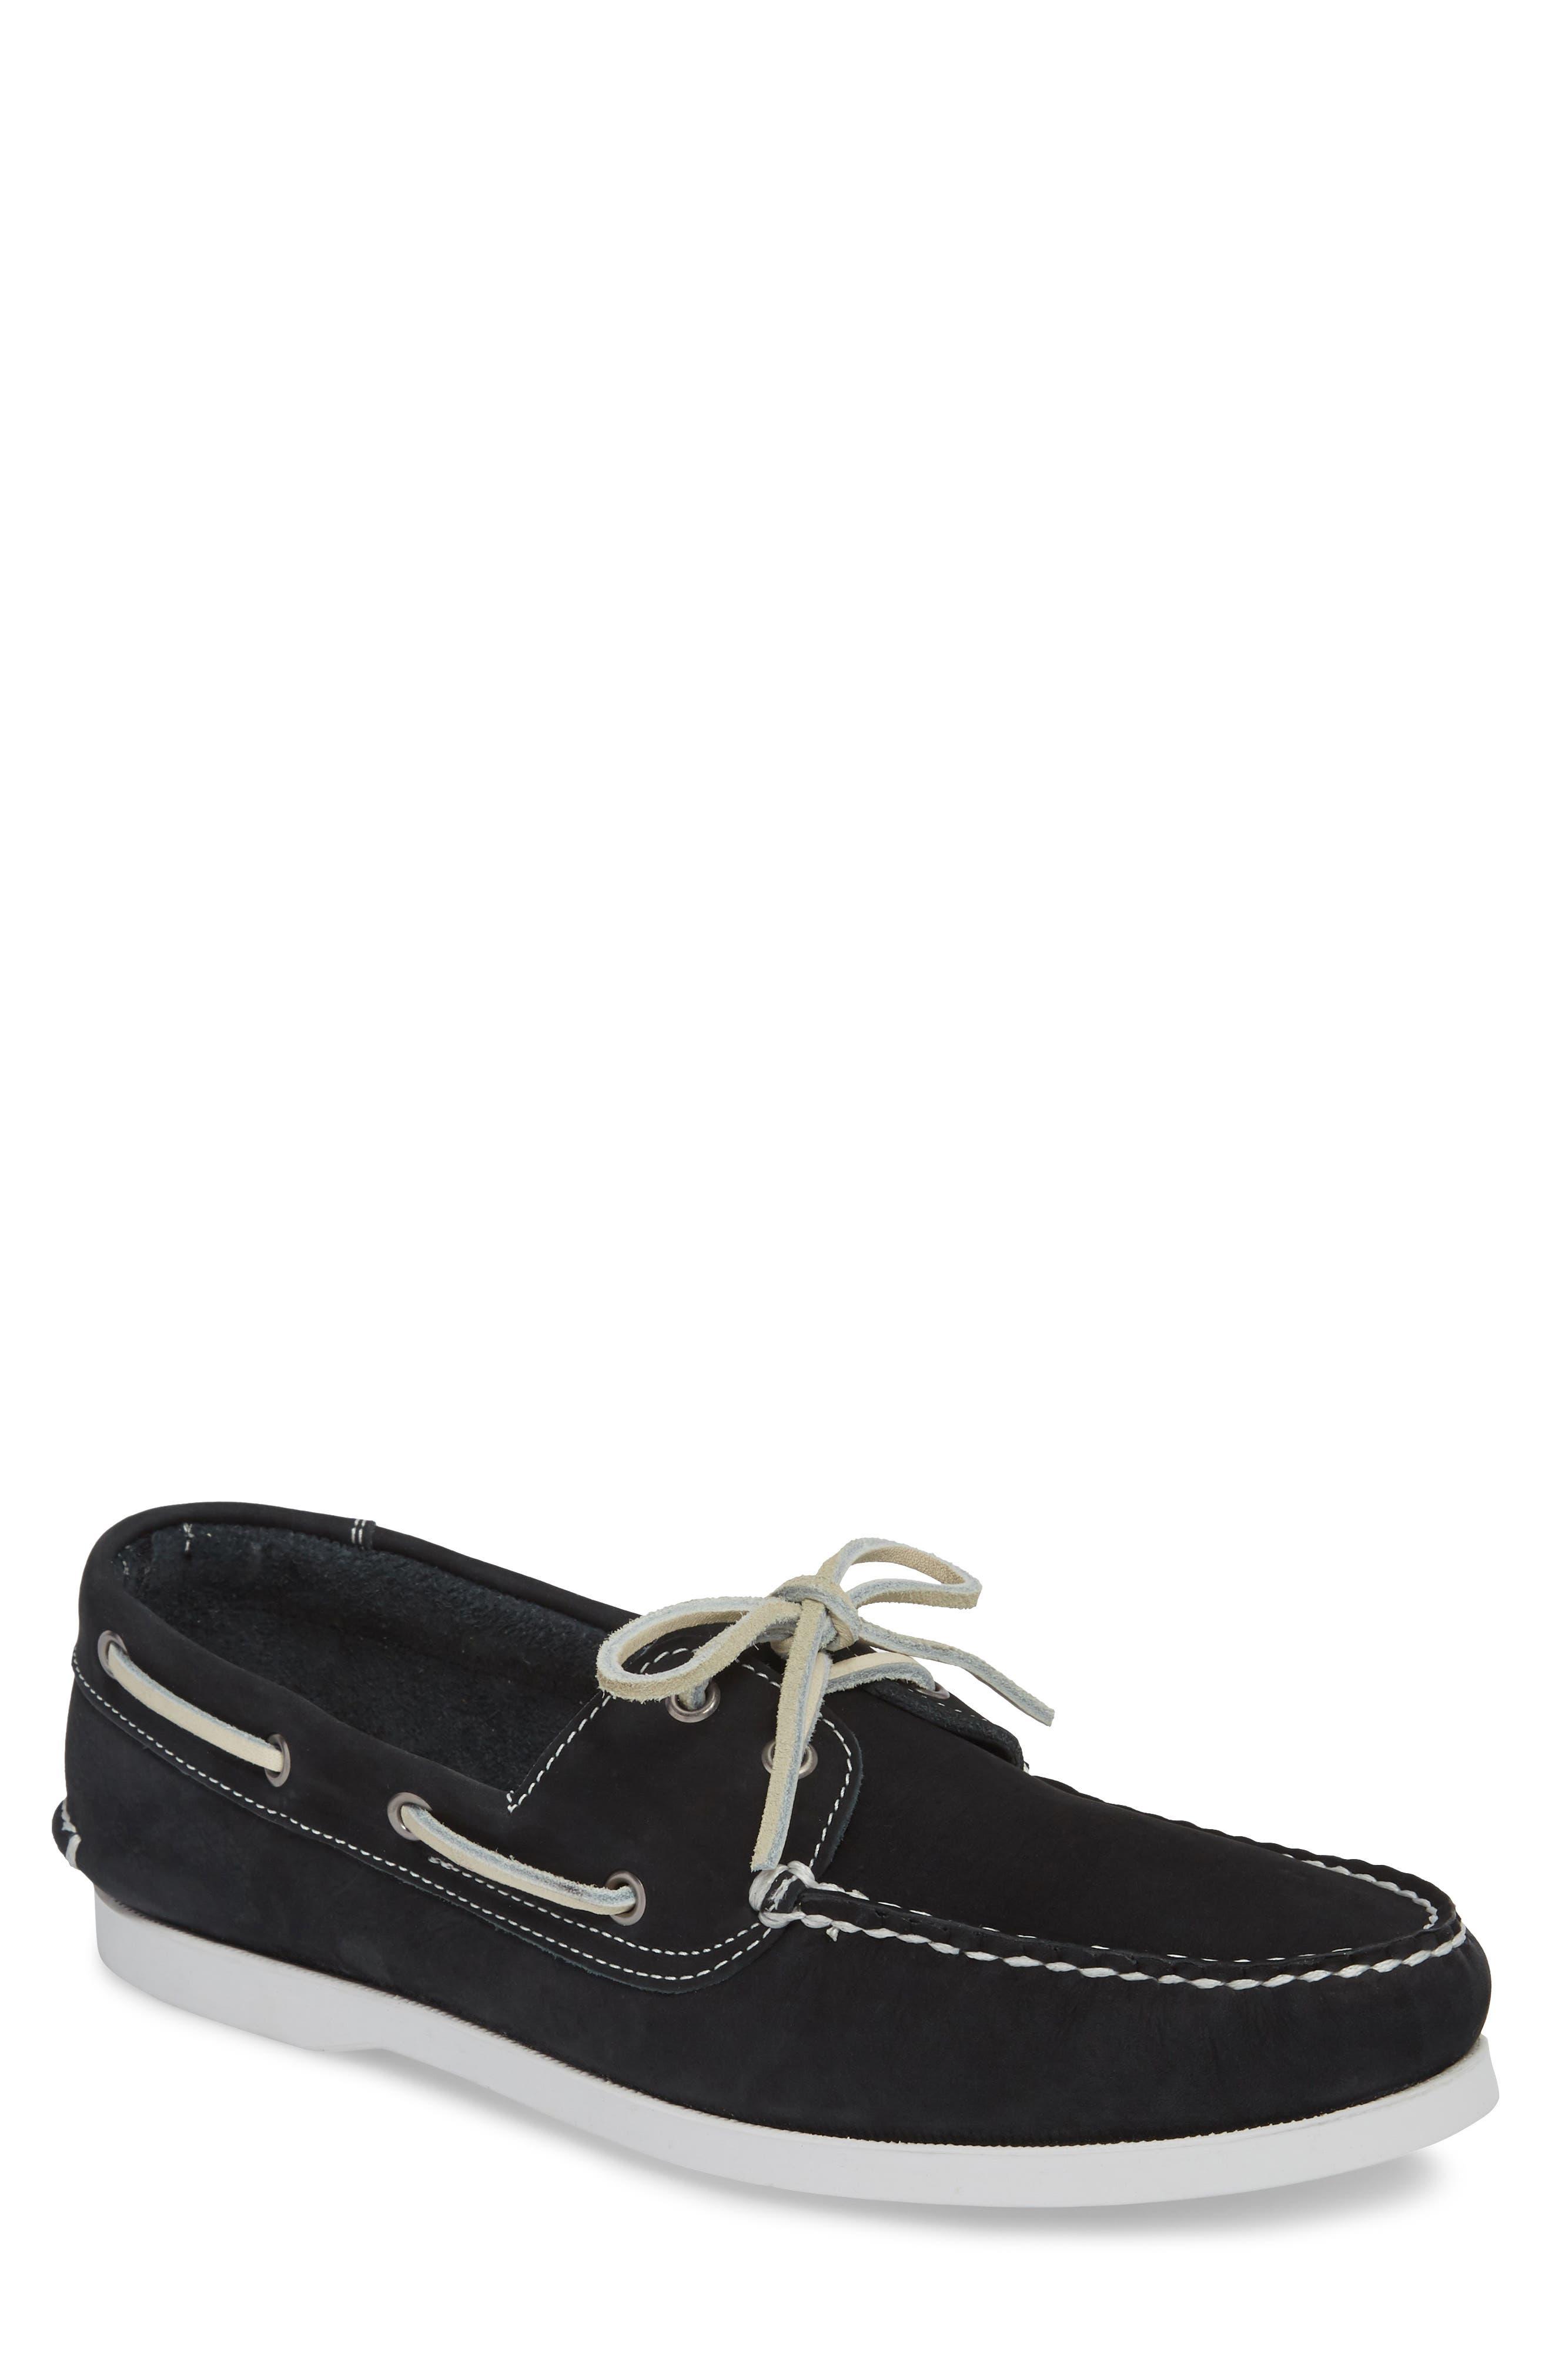 Pacific Boat Shoe,                         Main,                         color, NAVY NUBUCK